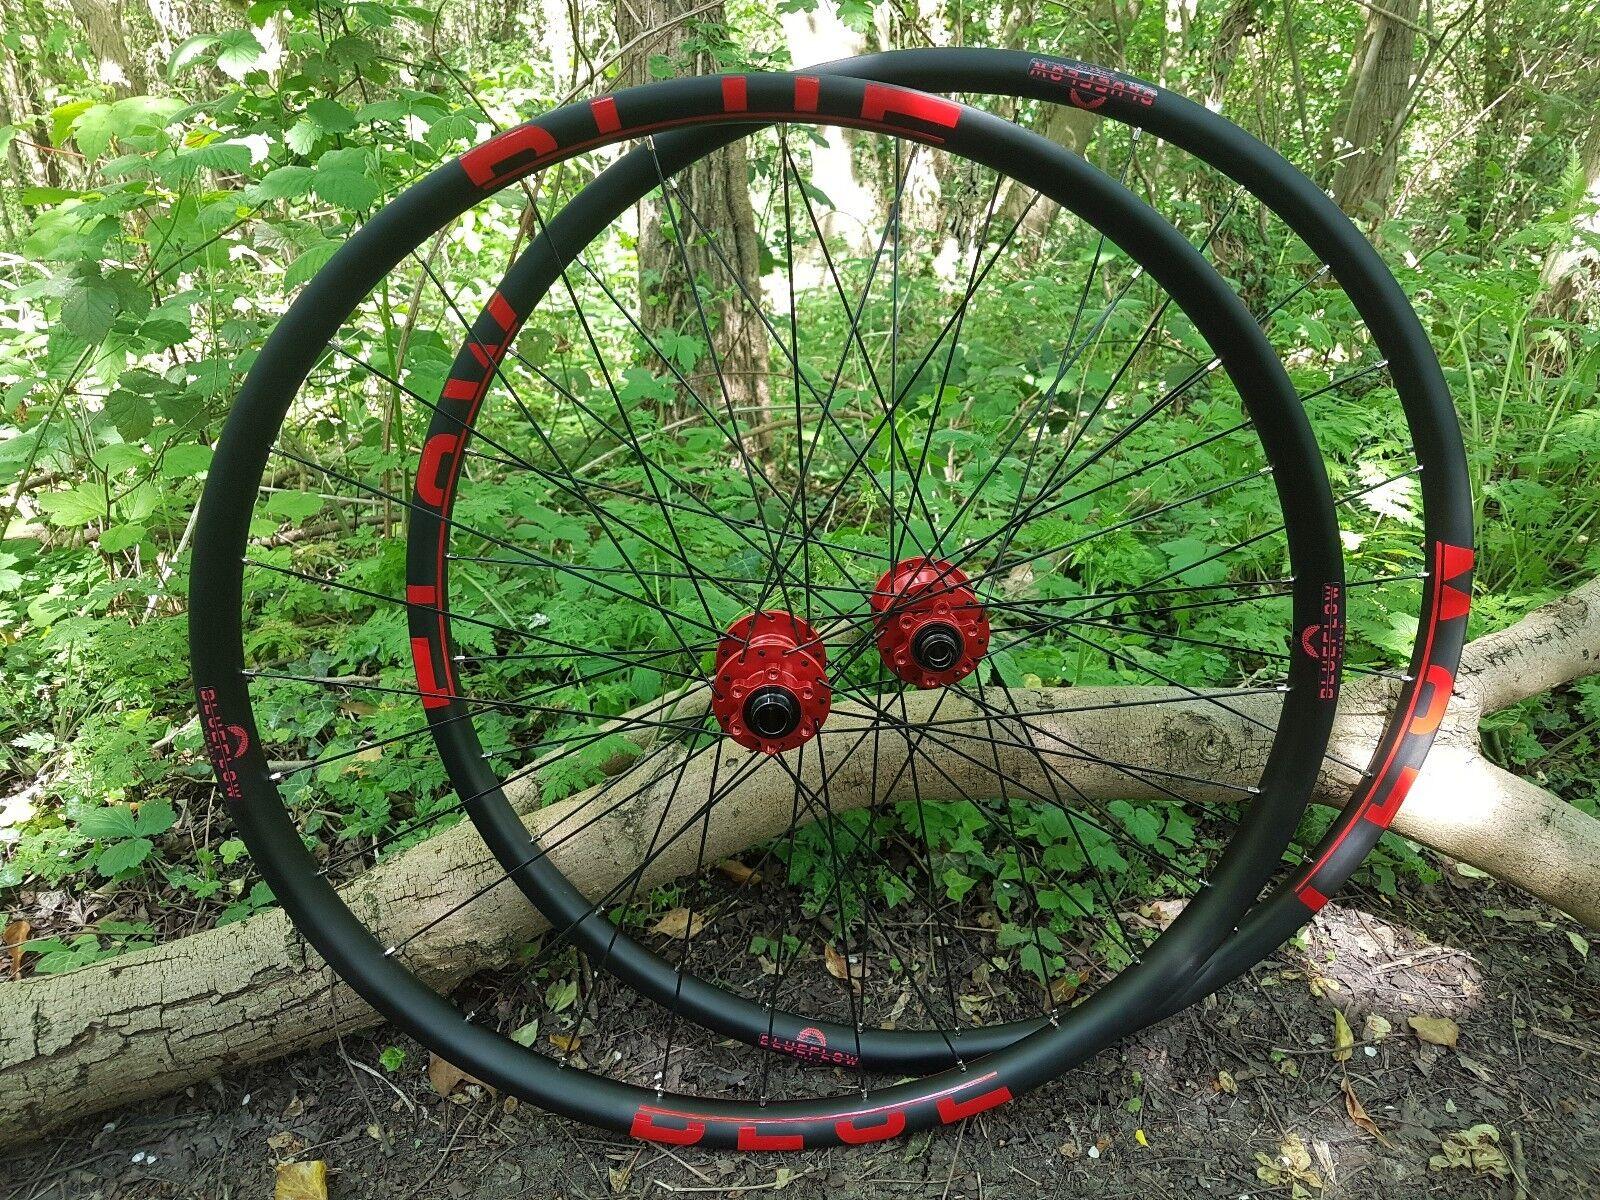 bluee Flow BF37 31 all mountain carbon wheels 27.5 29 Hope Pro 4 mountain bike AM